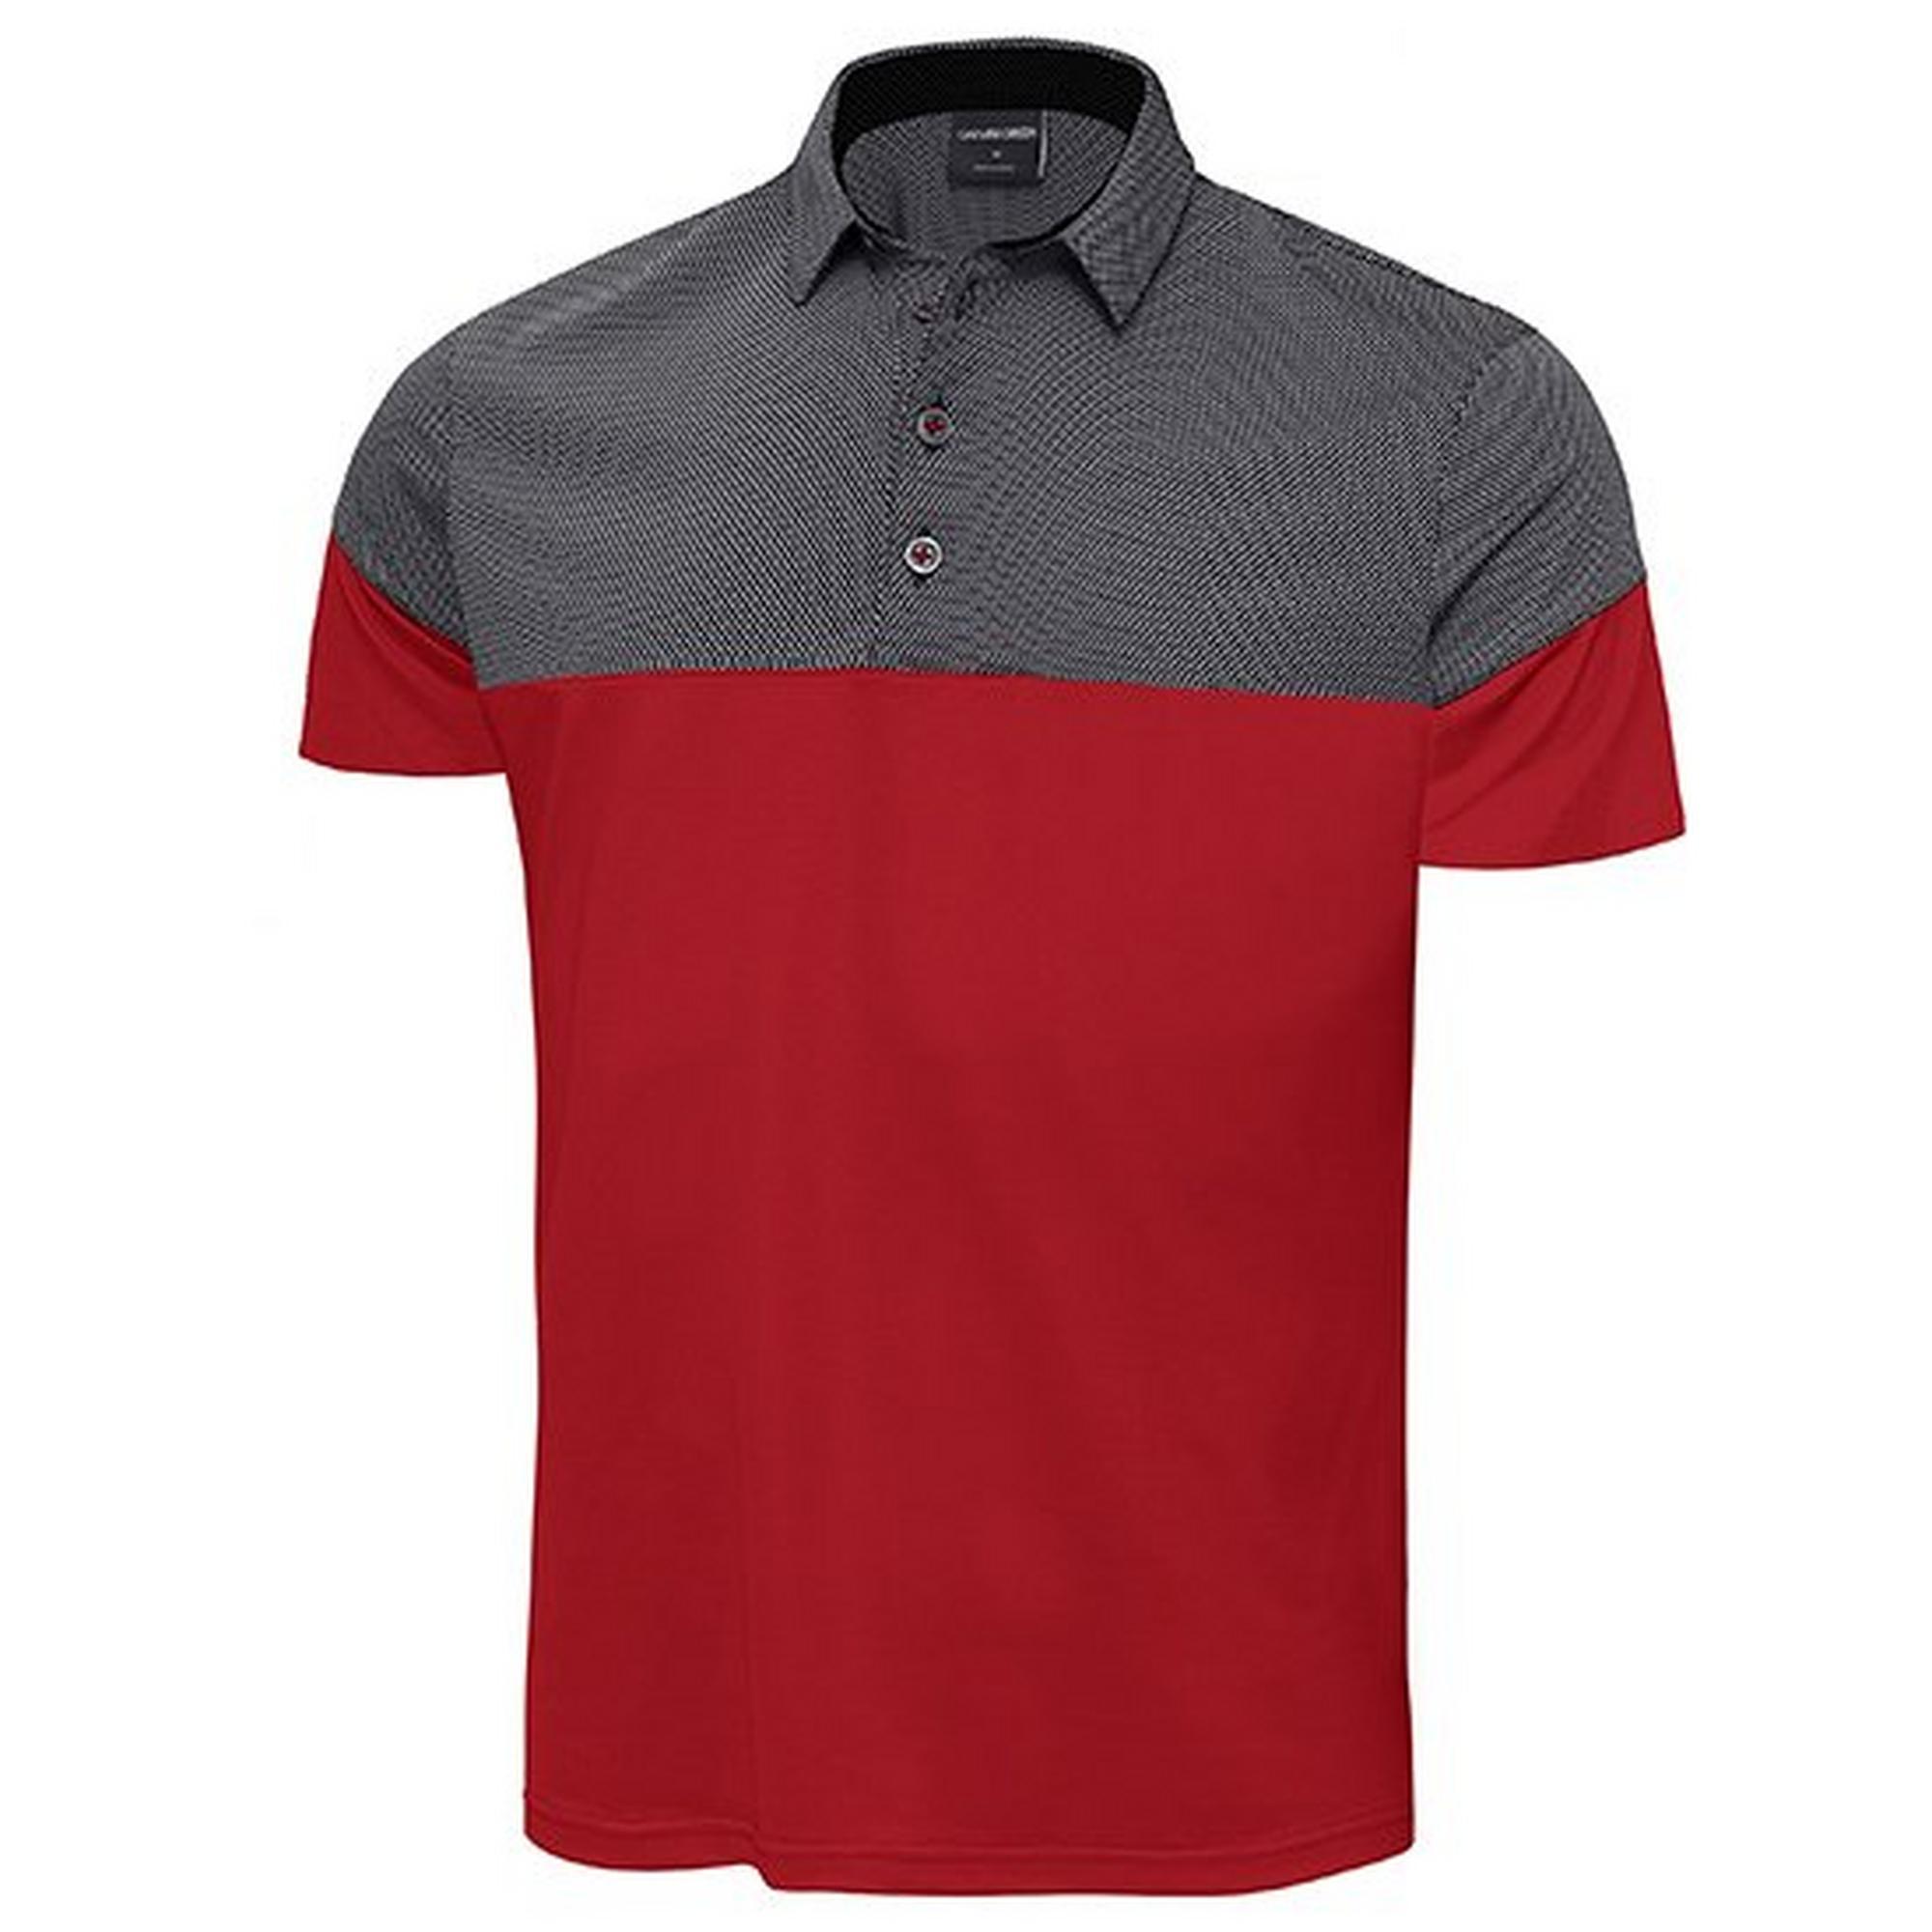 Men's Milton VENTIL8 PLUS Short Sleeve Shirt